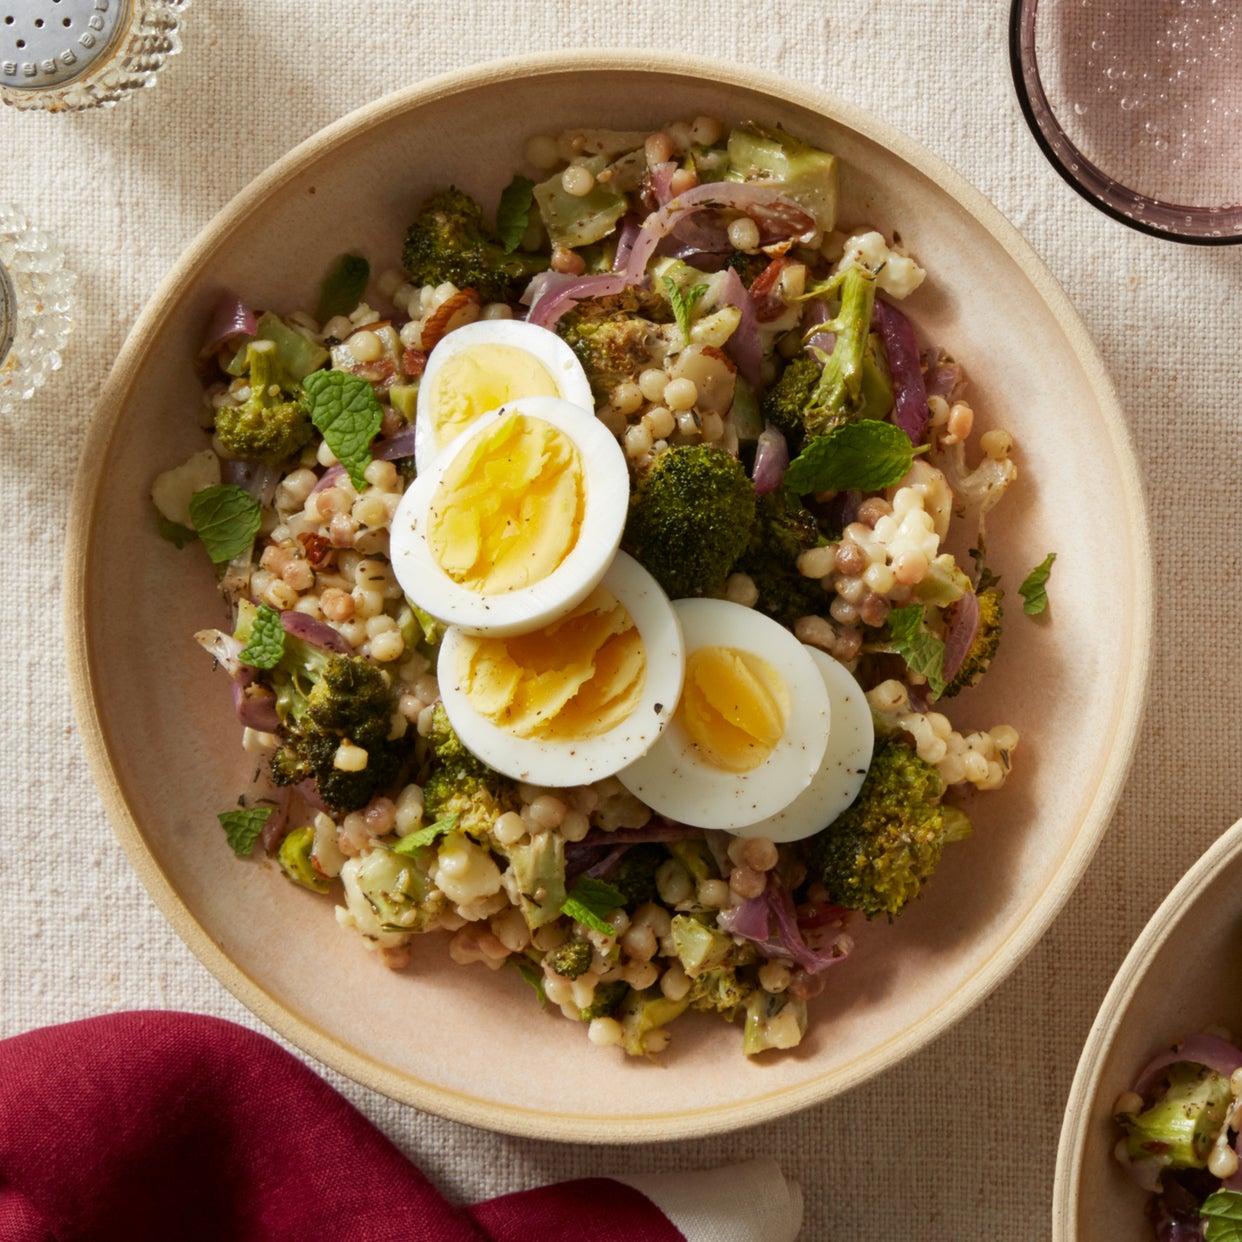 Roasted Broccoli & Fregola Sarda Salad with Za'atar & Tahini Dressing